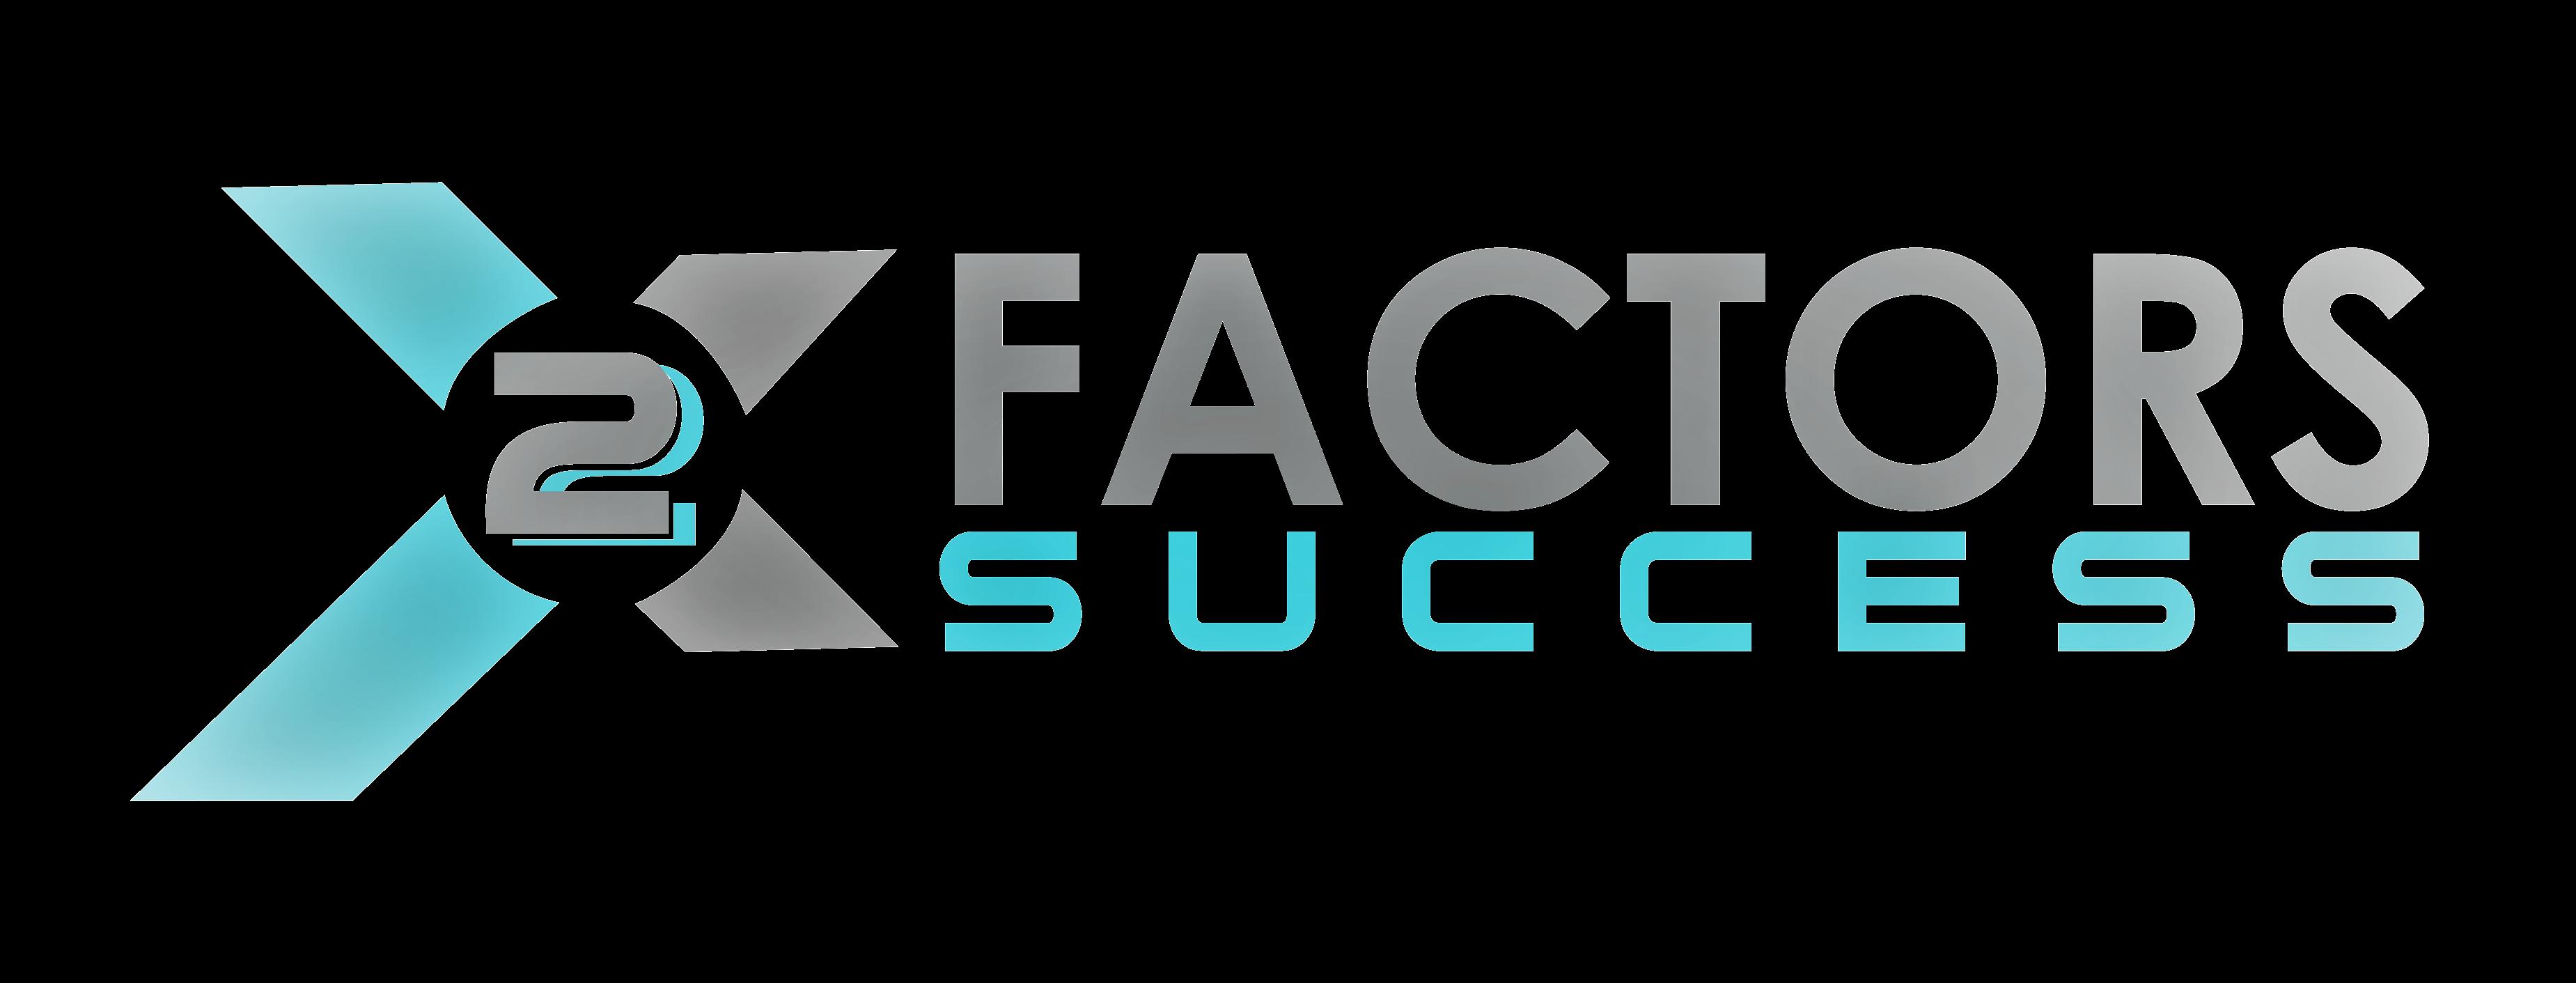 Edited Xfactors2succes-Transparant (2)